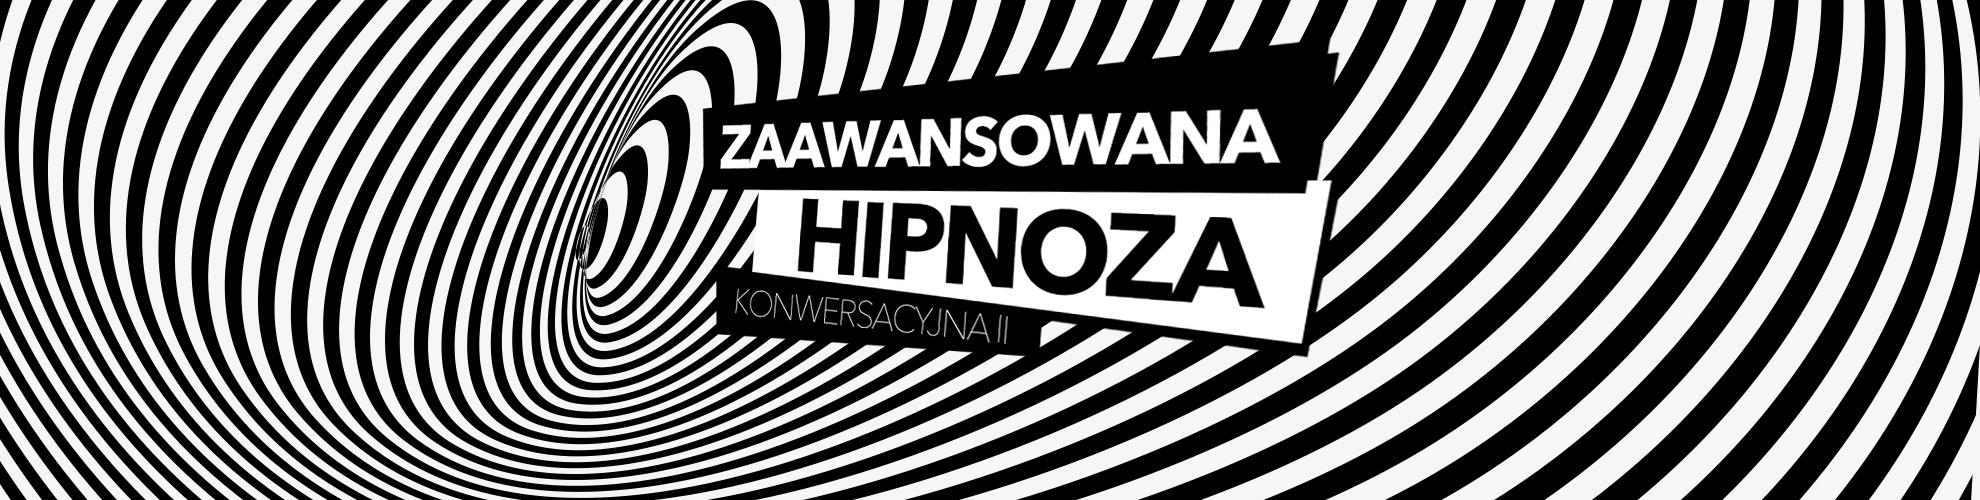 1980_500_hipnoza